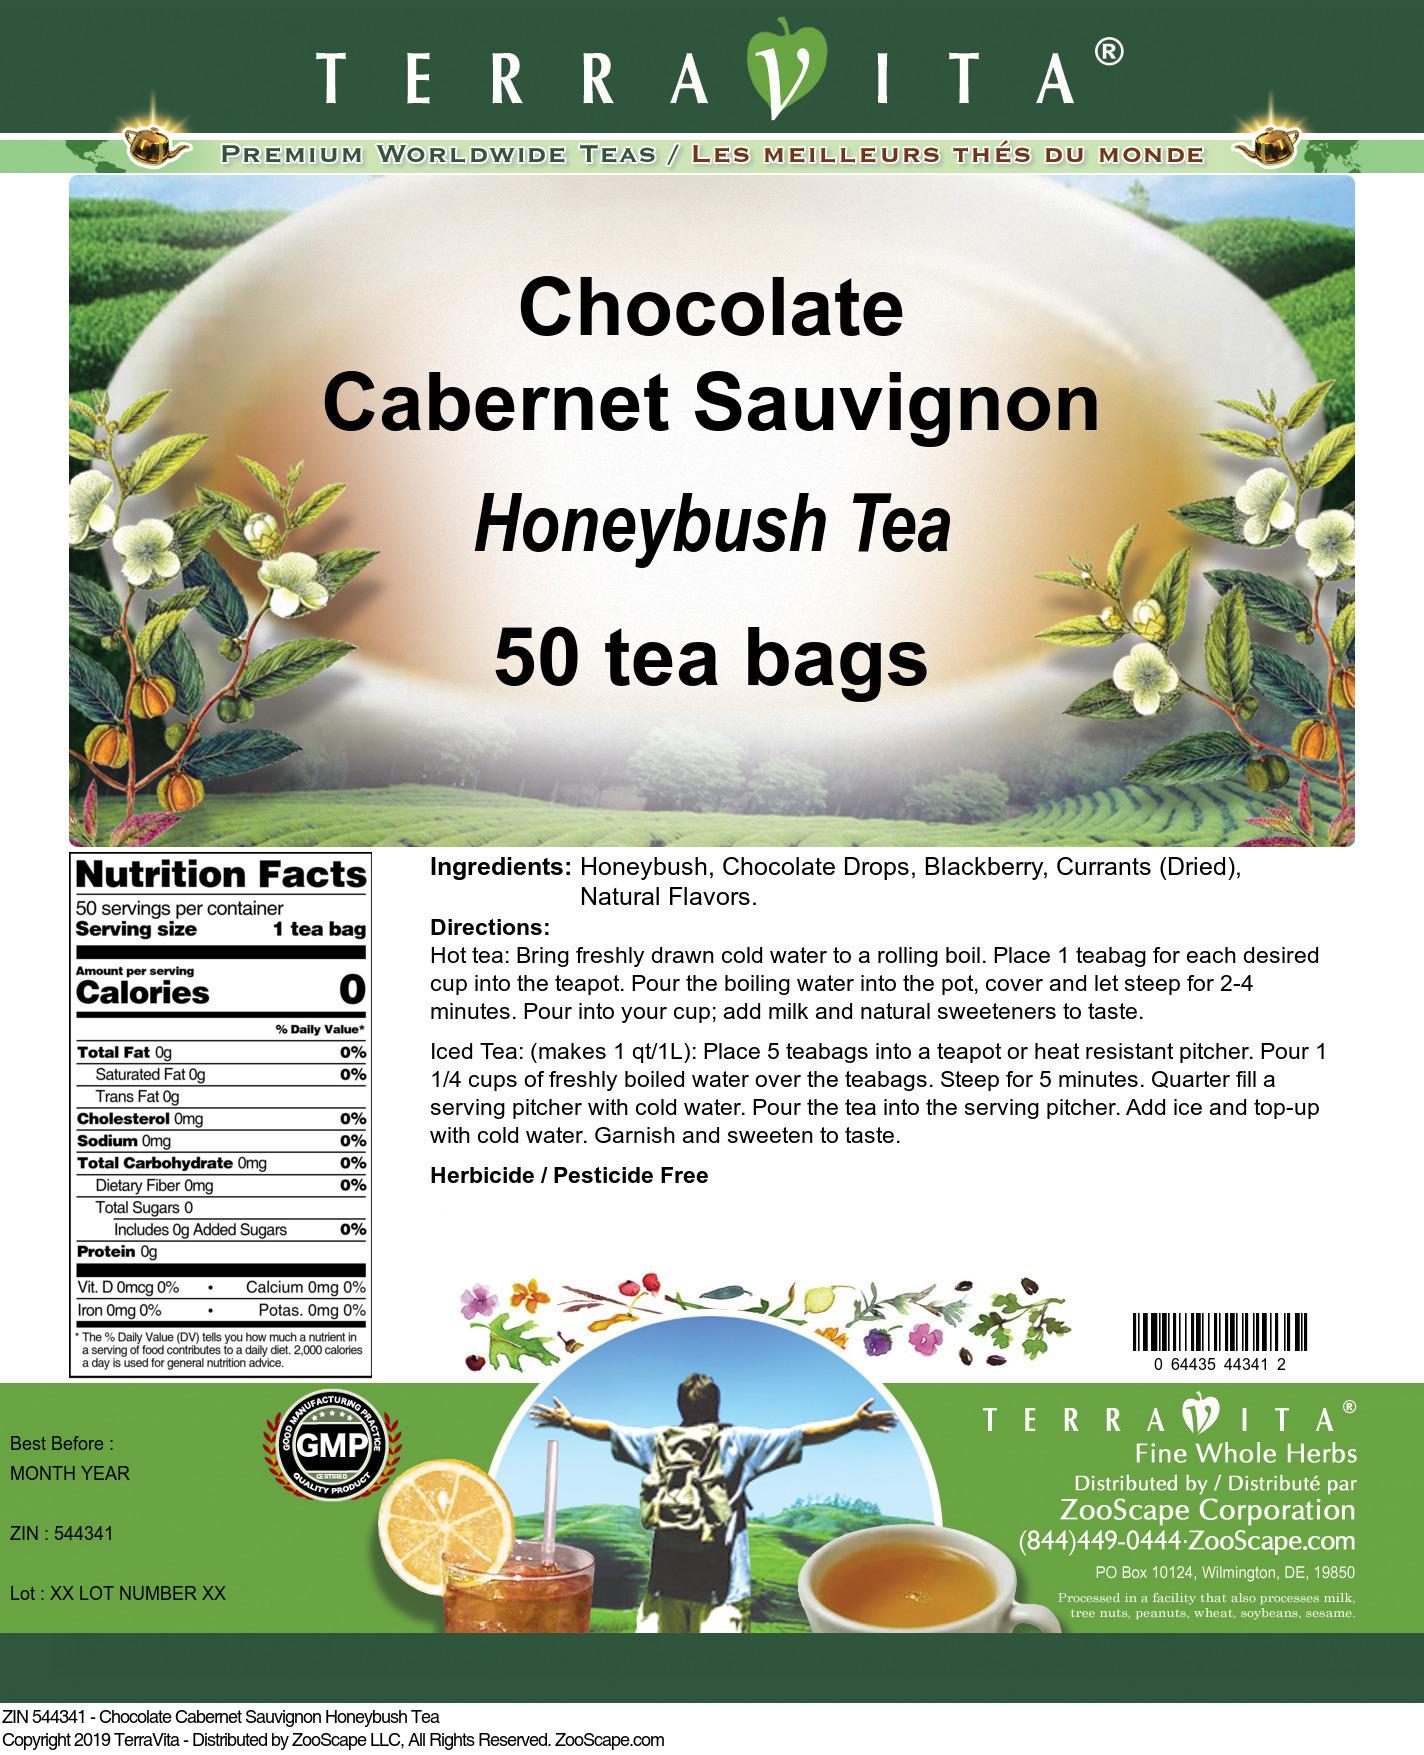 Chocolate Cabernet Sauvignon Honeybush Tea